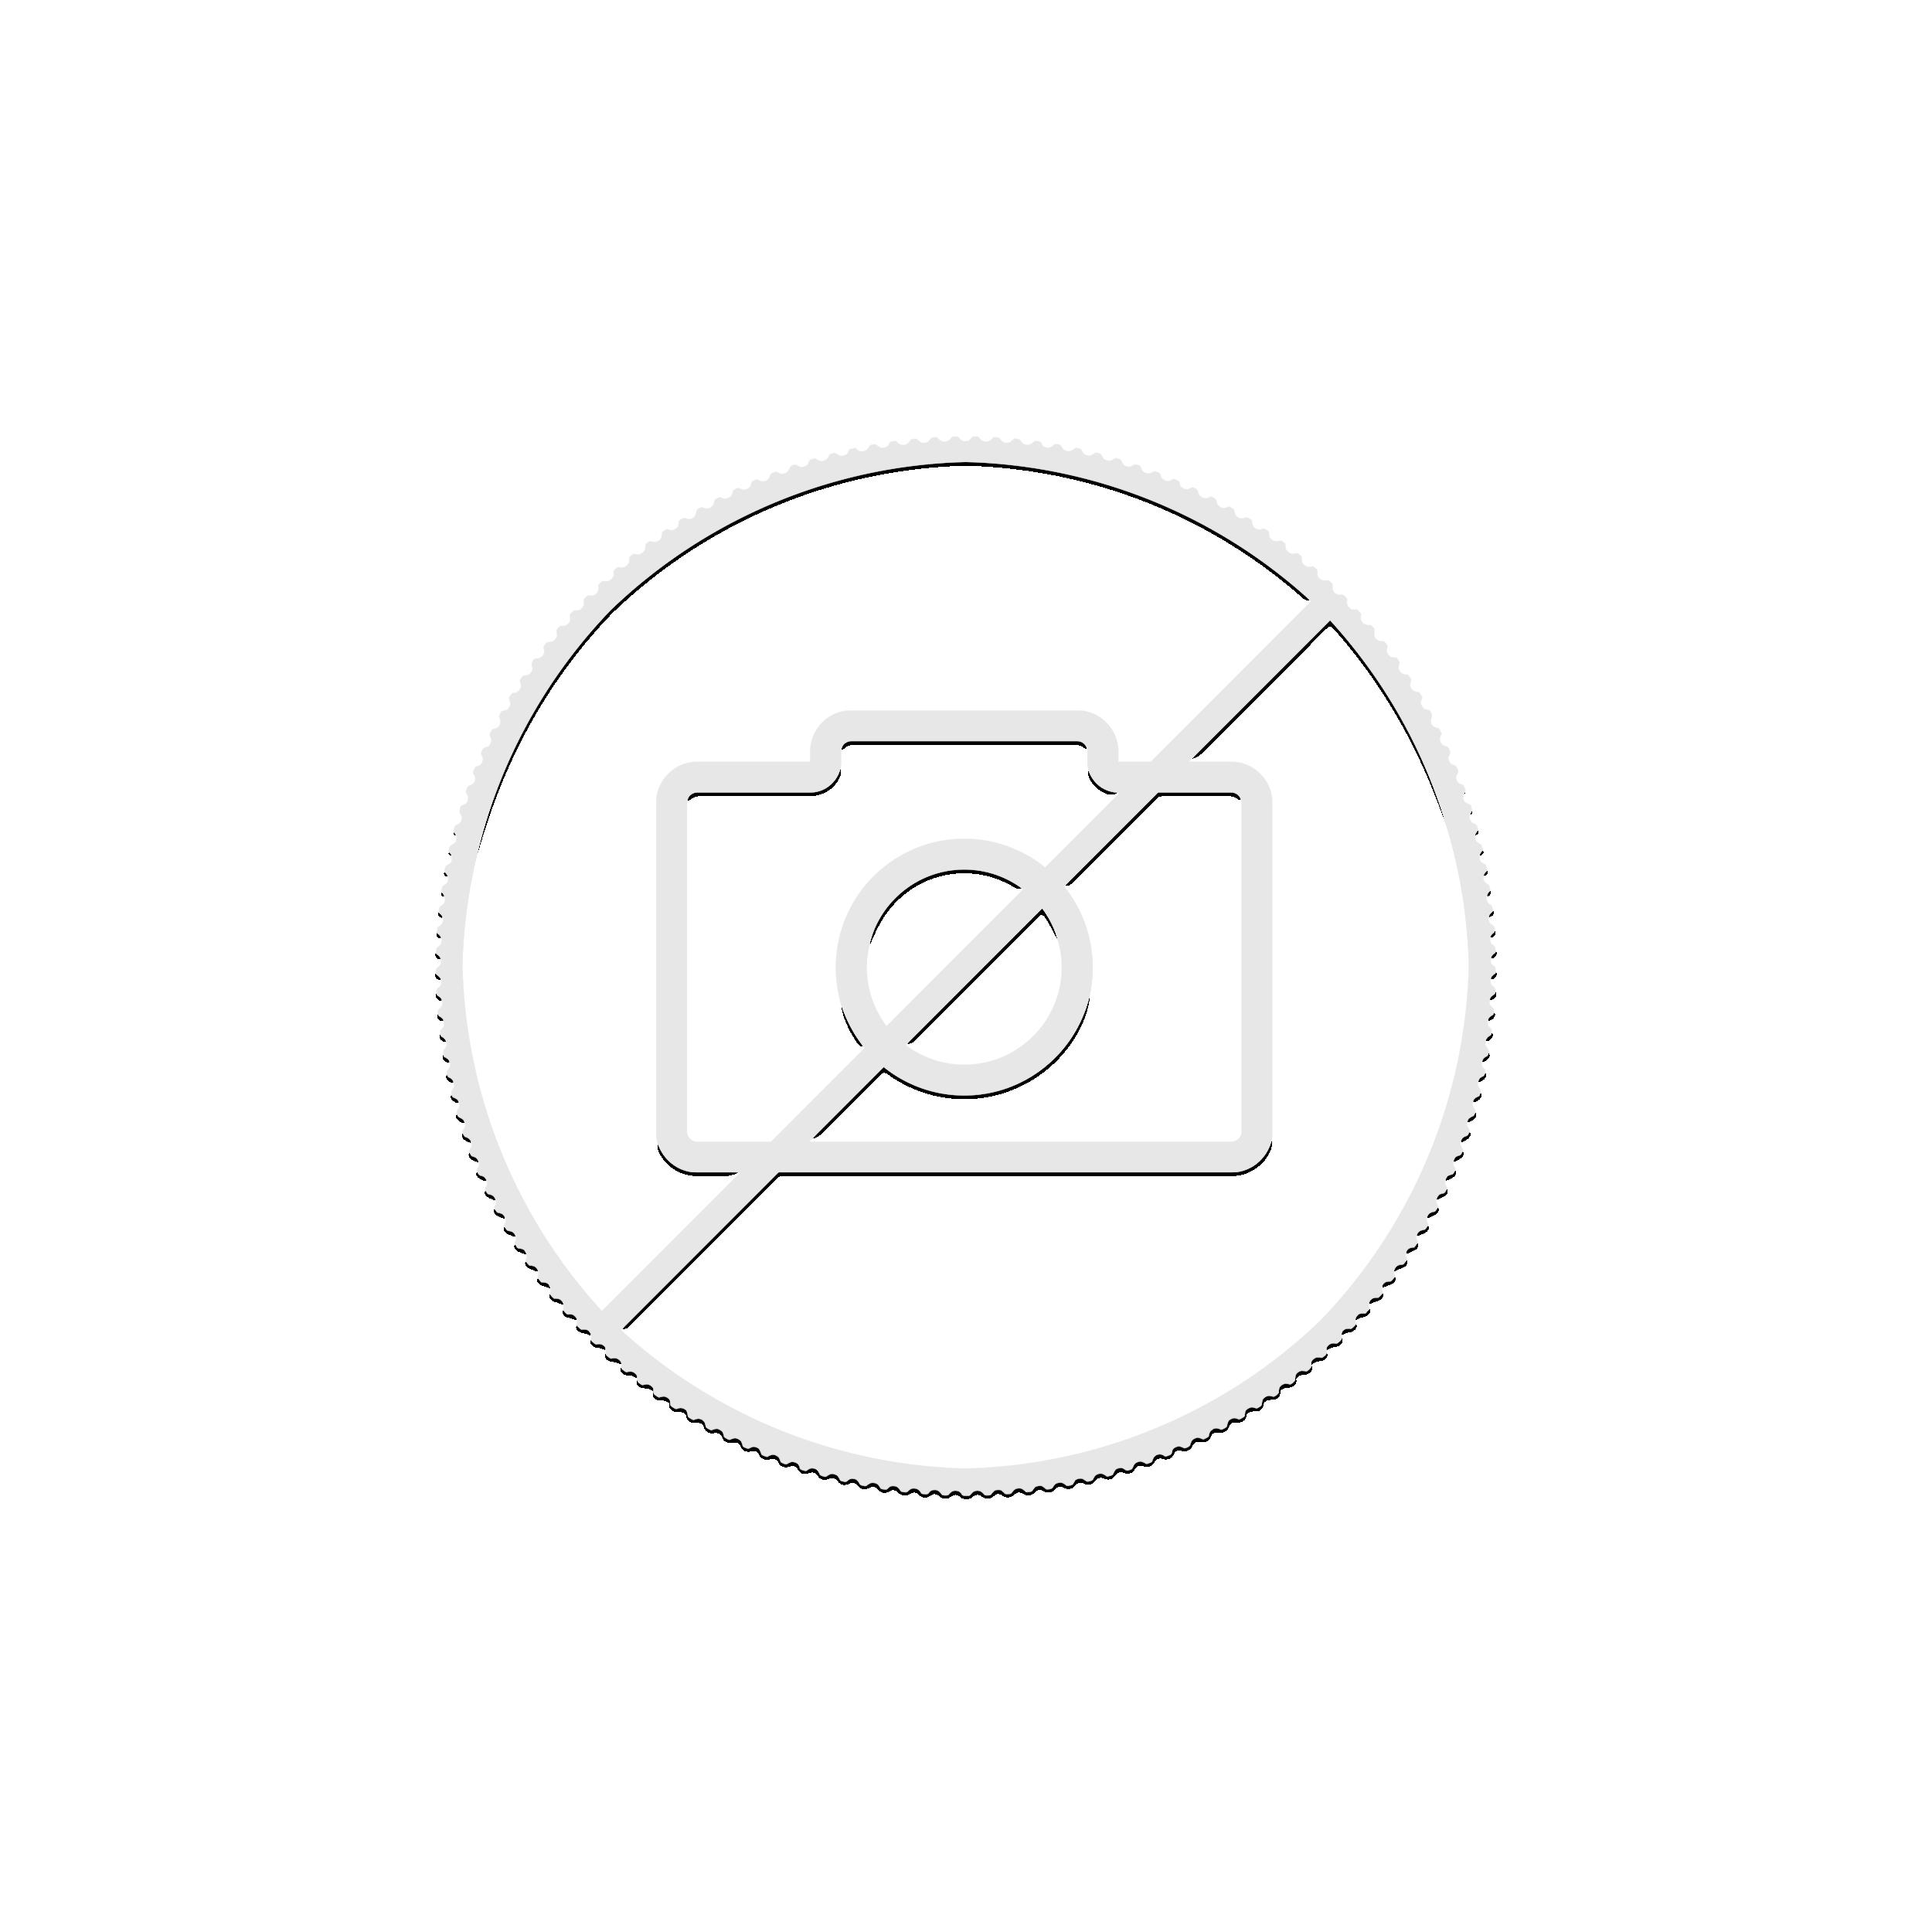 Diverse gouden tien euro munten